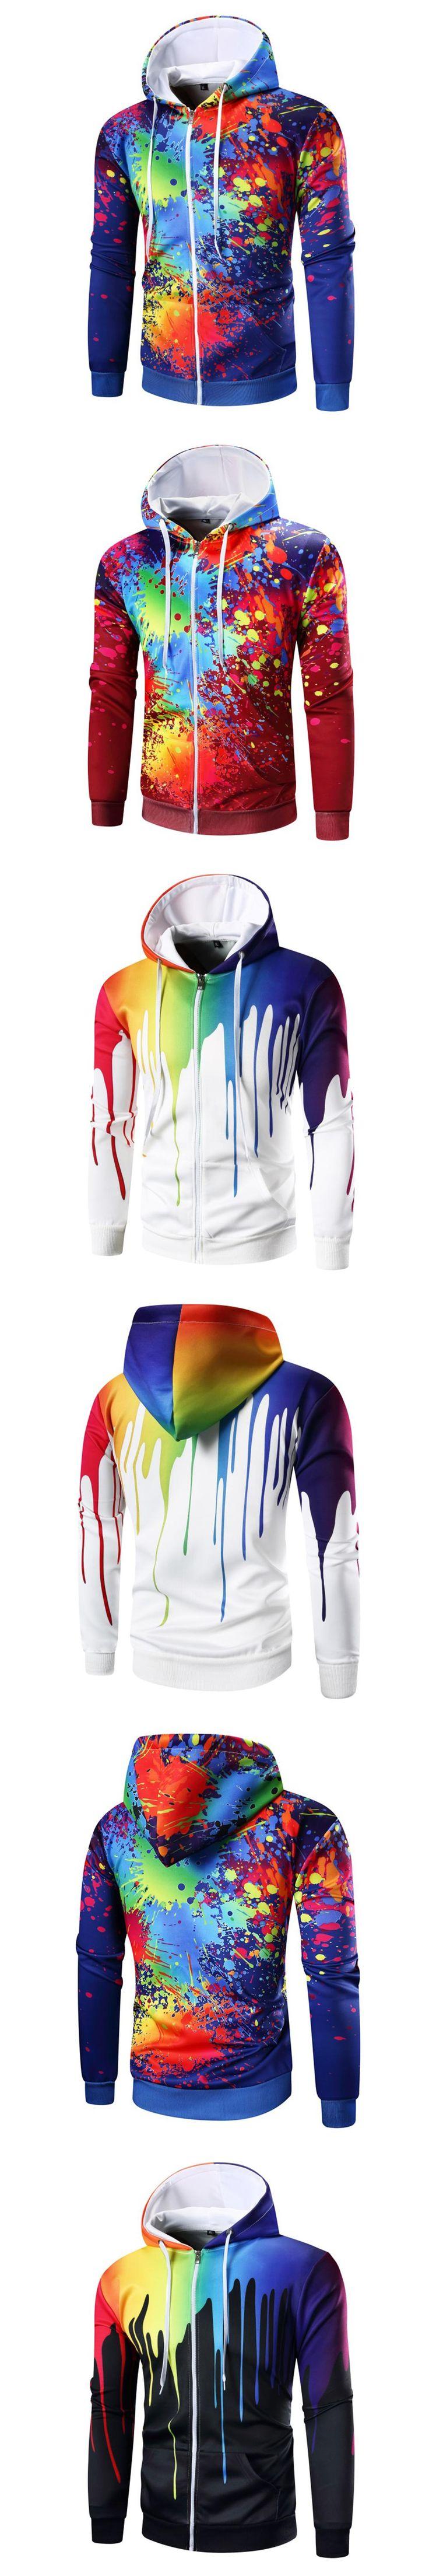 Autumn Hoodies Male Cardigan 2017 New Brand Zipper Sweatshirt Men 3D Printed Design Square Collar Hoodies High Quality Hoodies